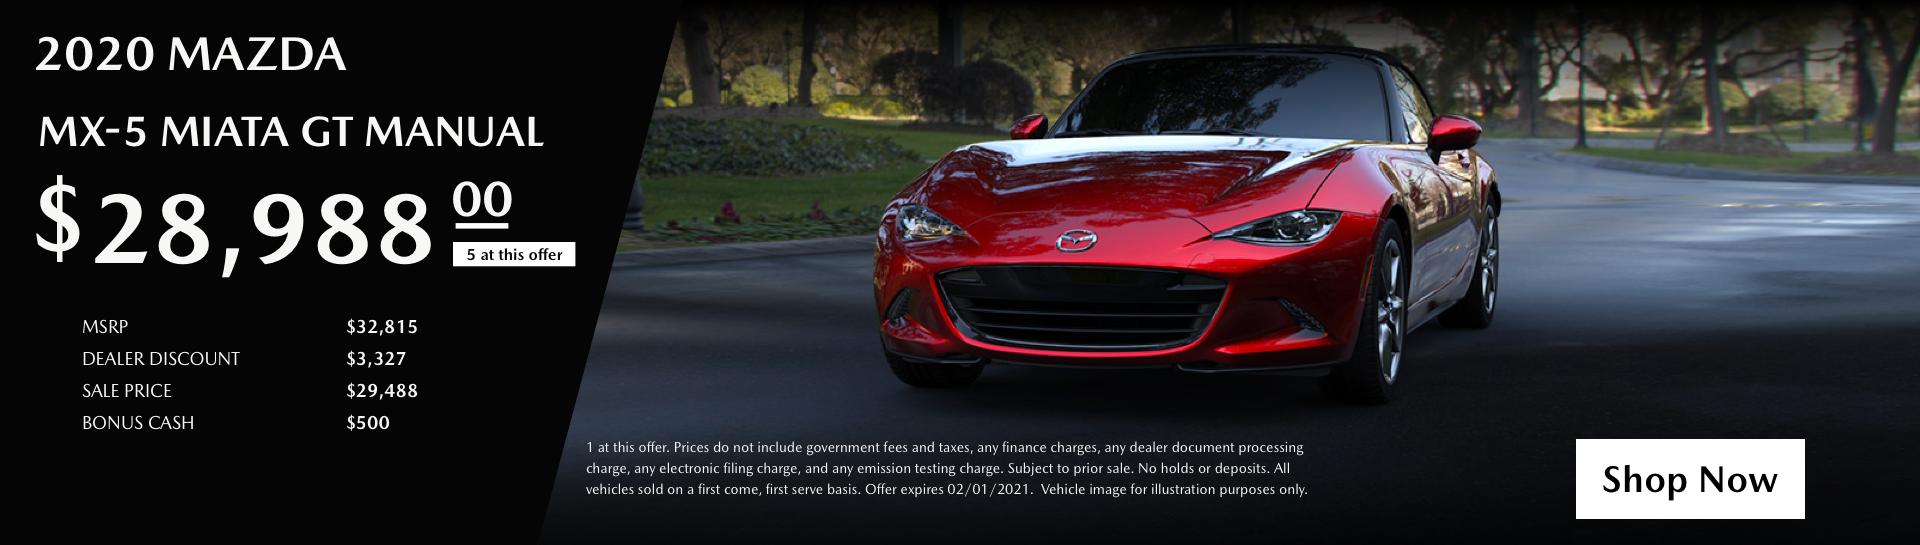 January 2020 Mazda Miata GTv2